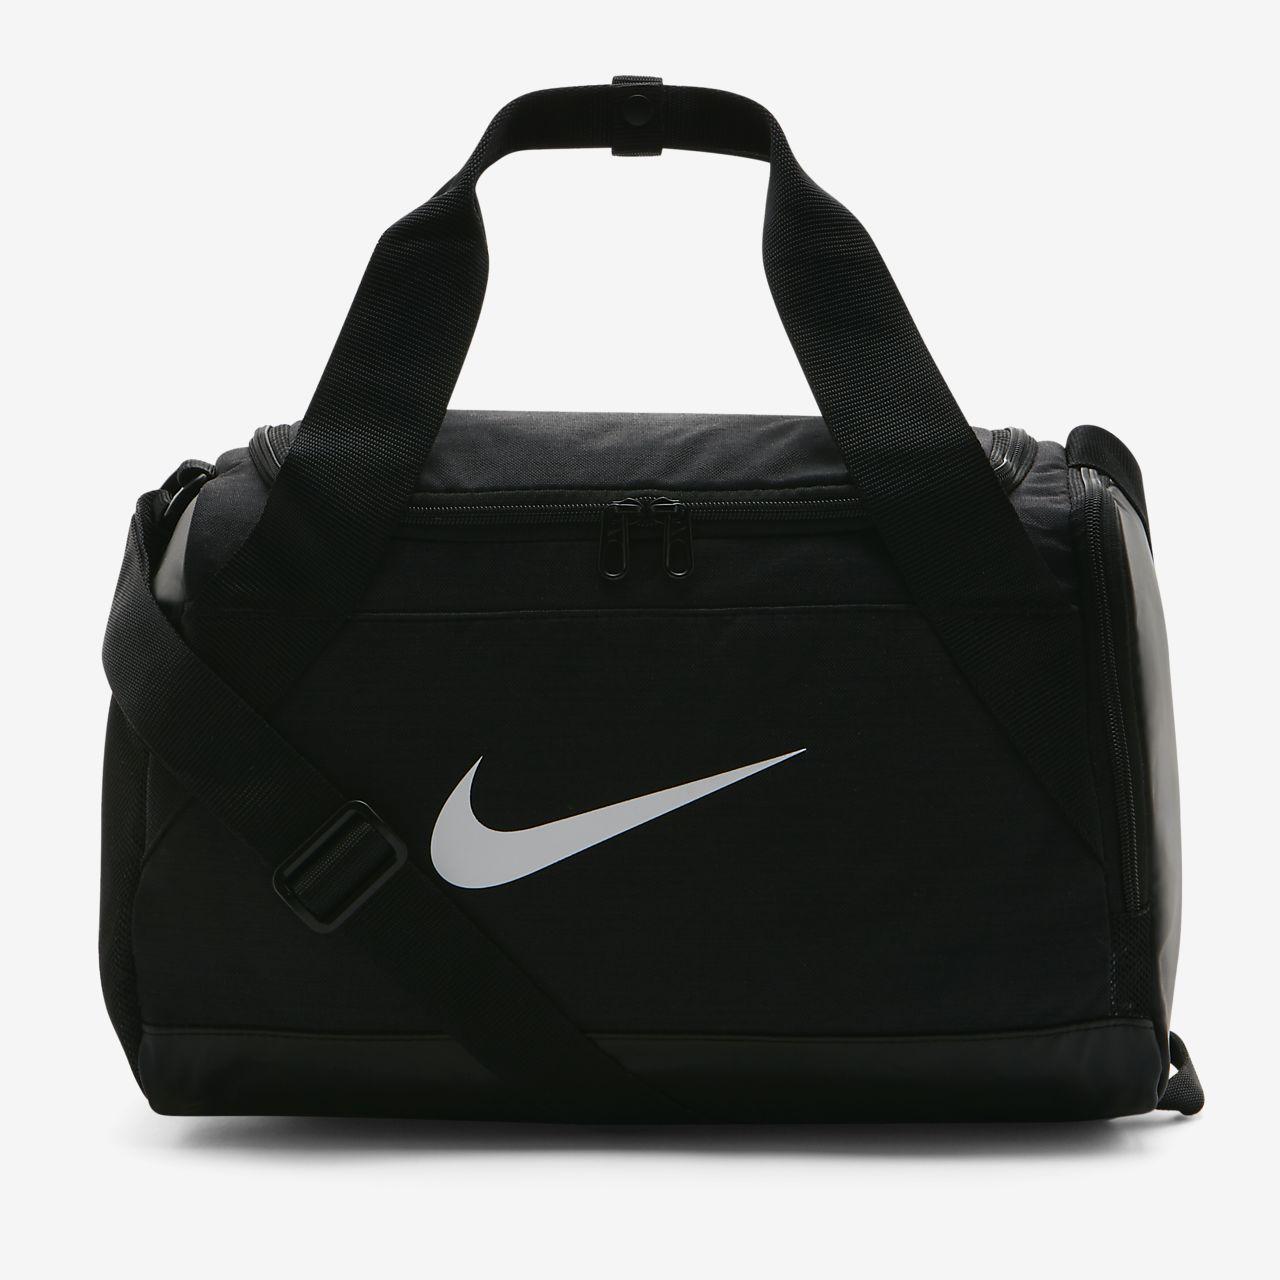 Sac de sport de training Nike Brasilia (très petite taille)